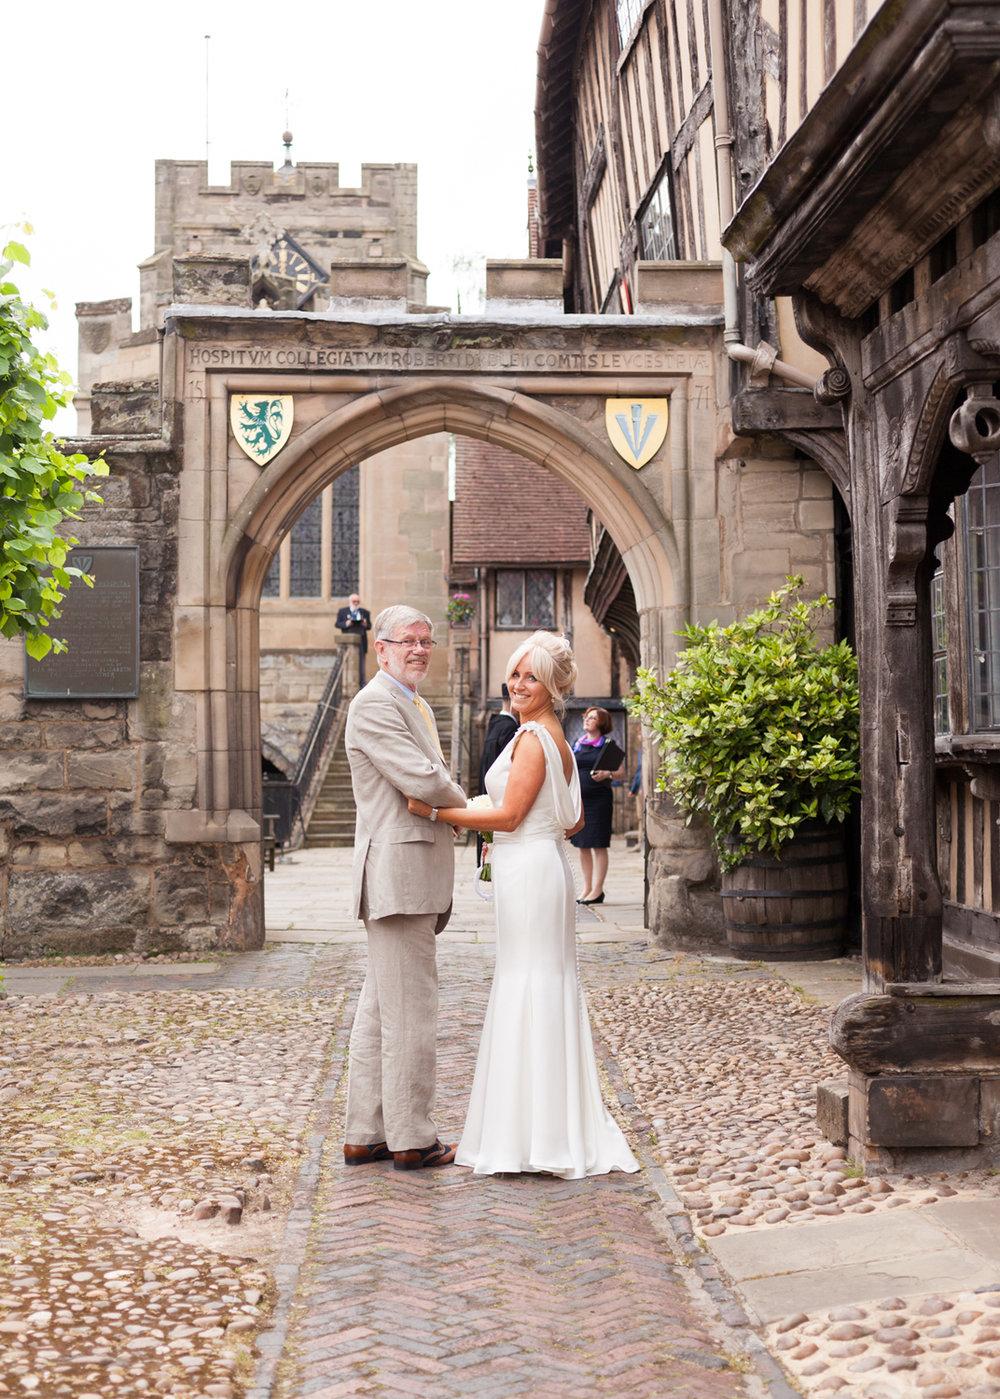 Wedding-Photography-Lord-Leycester-Hospital09.jpg